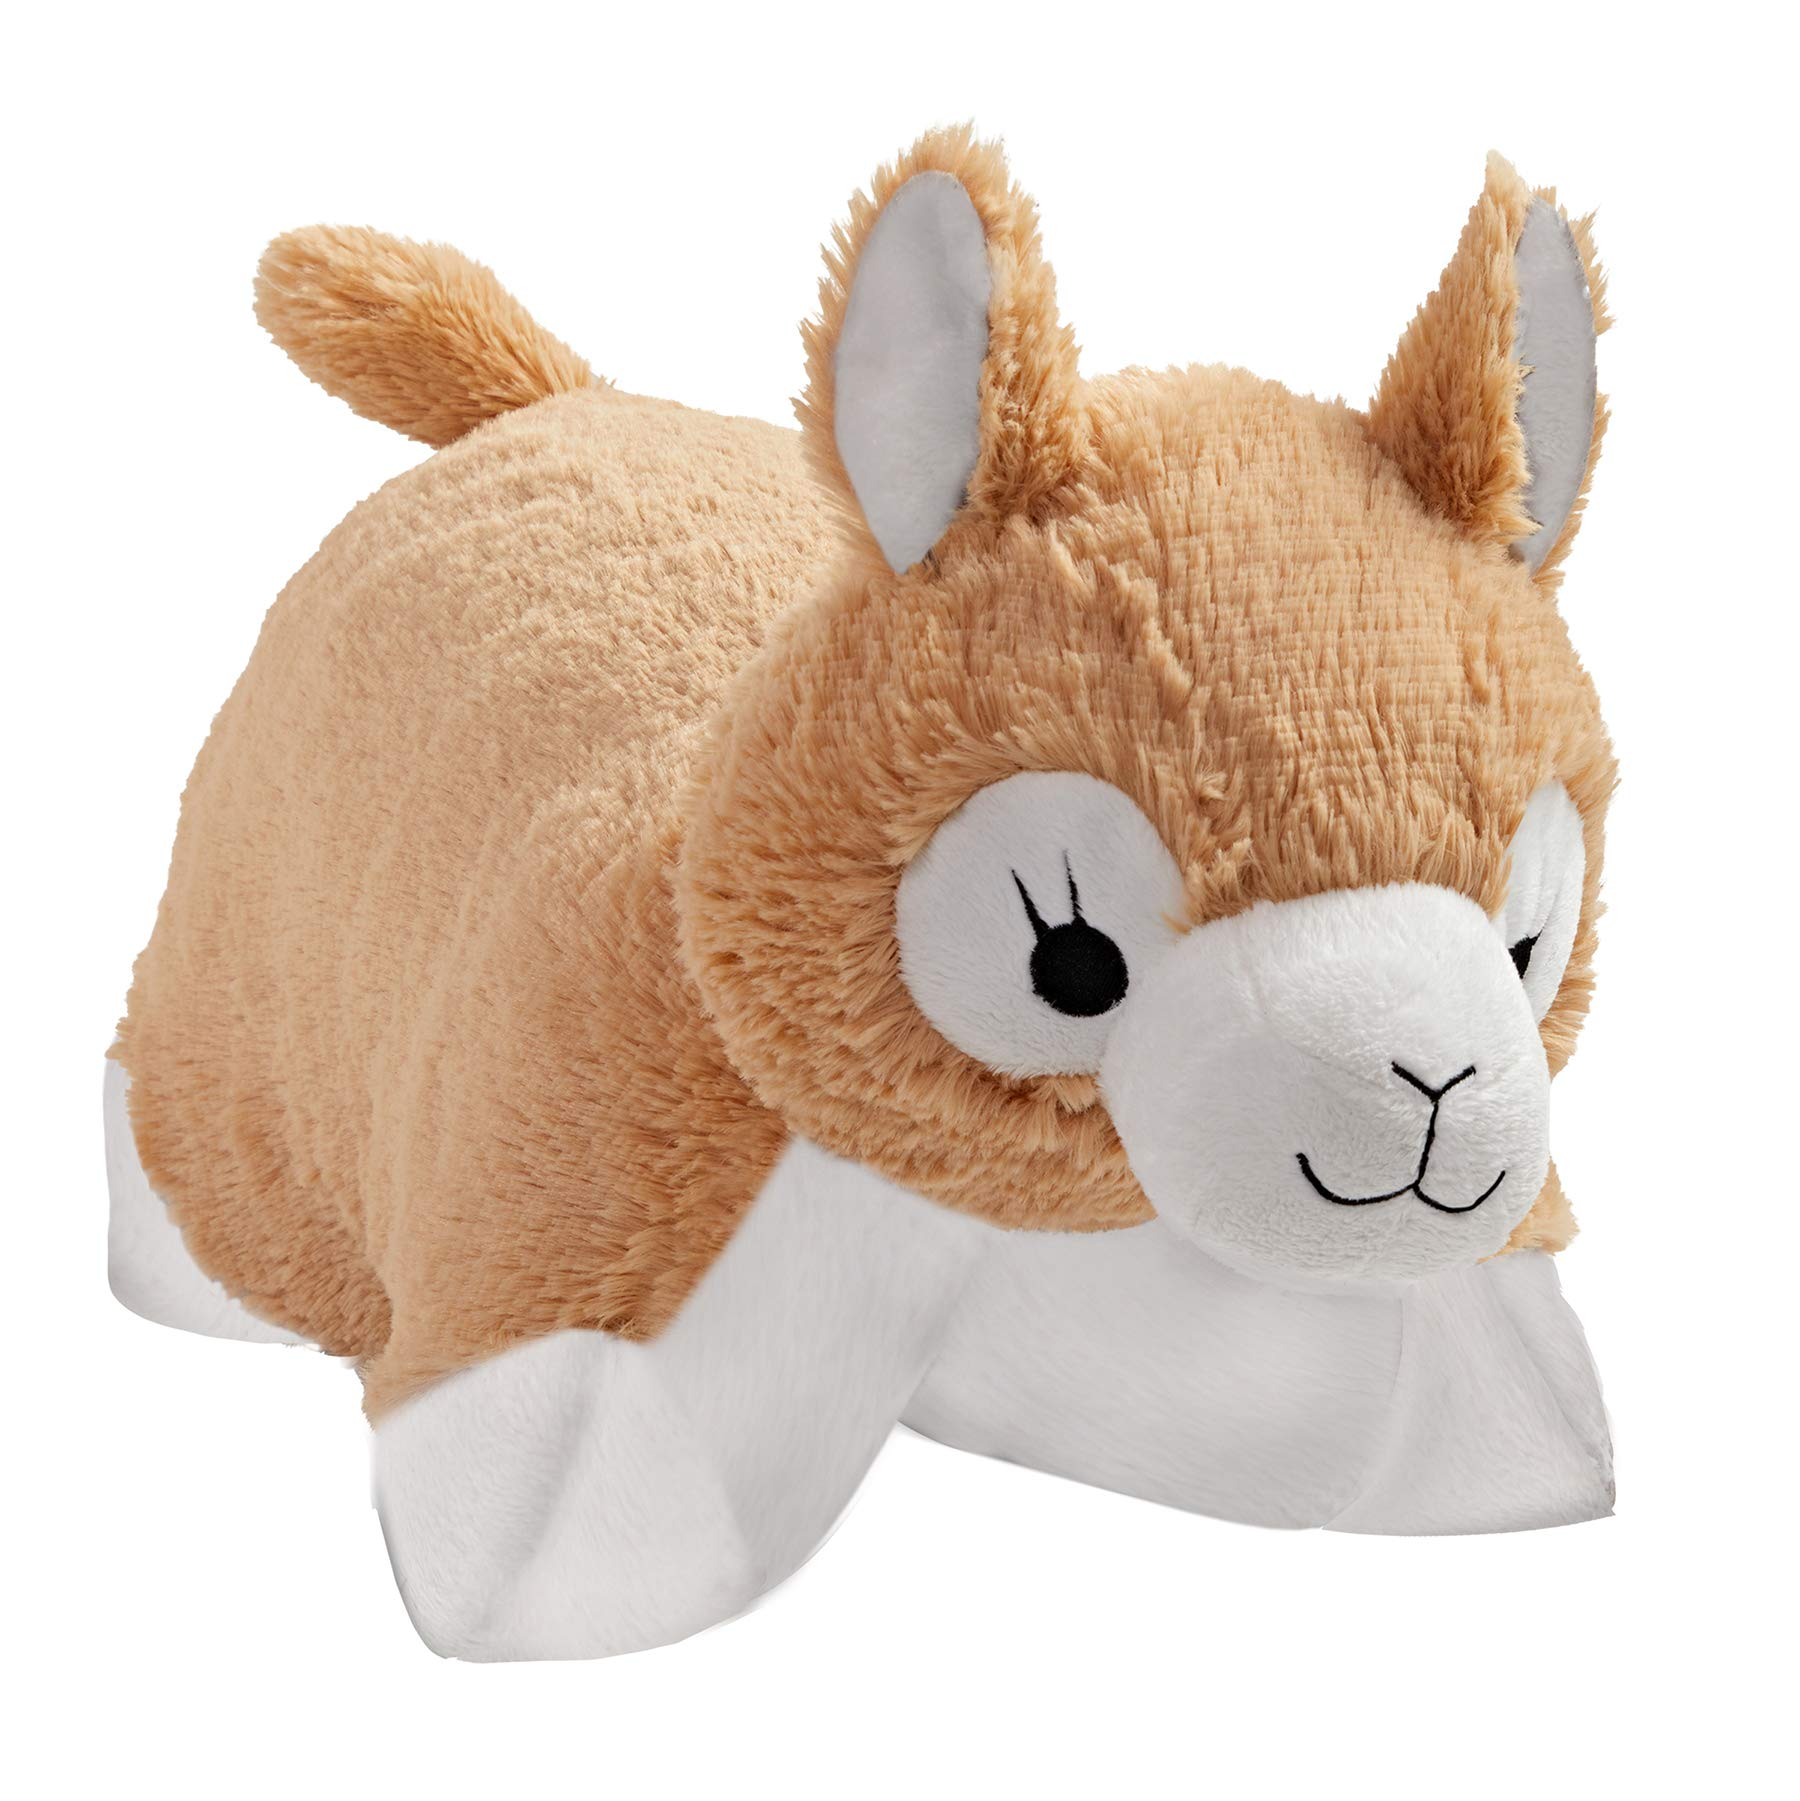 Pillow Pets Signature Lovable Llama - Stuffed Animal Plush Toy